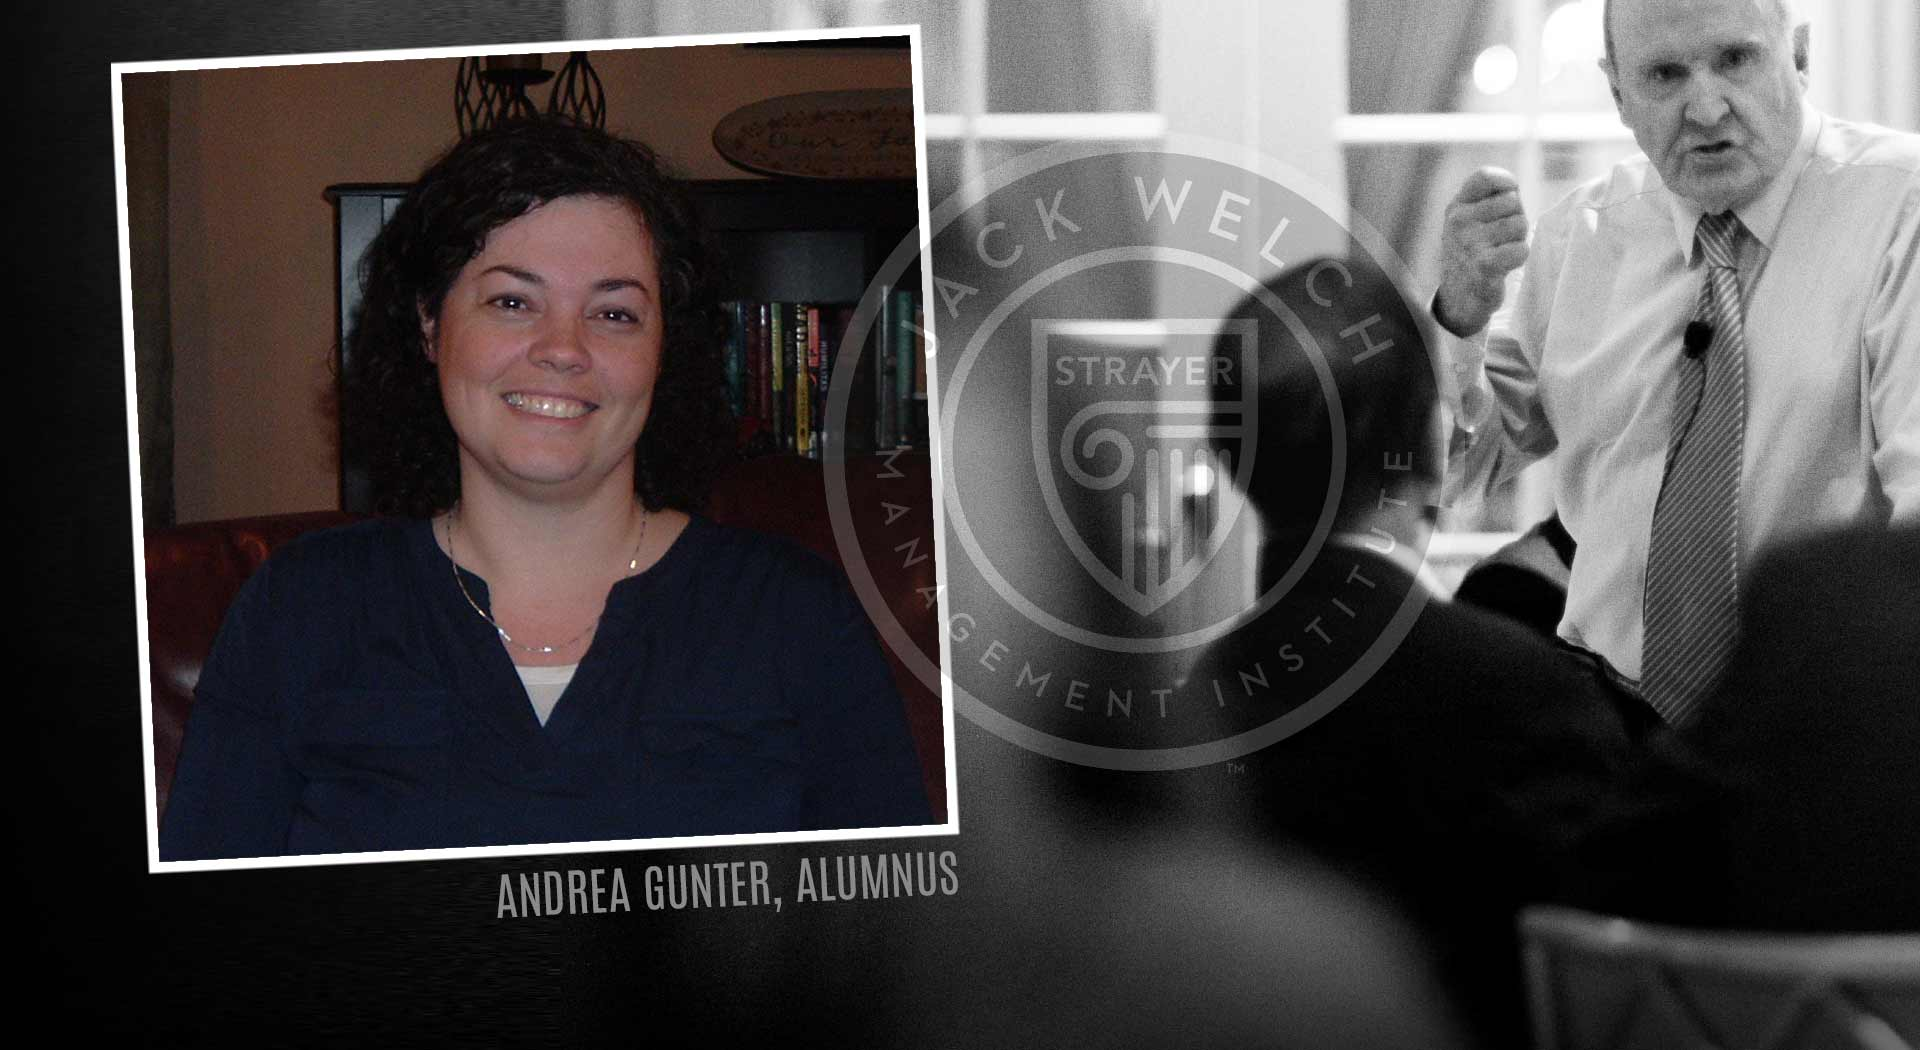 Jack Welch MBA, Andrea Gunter